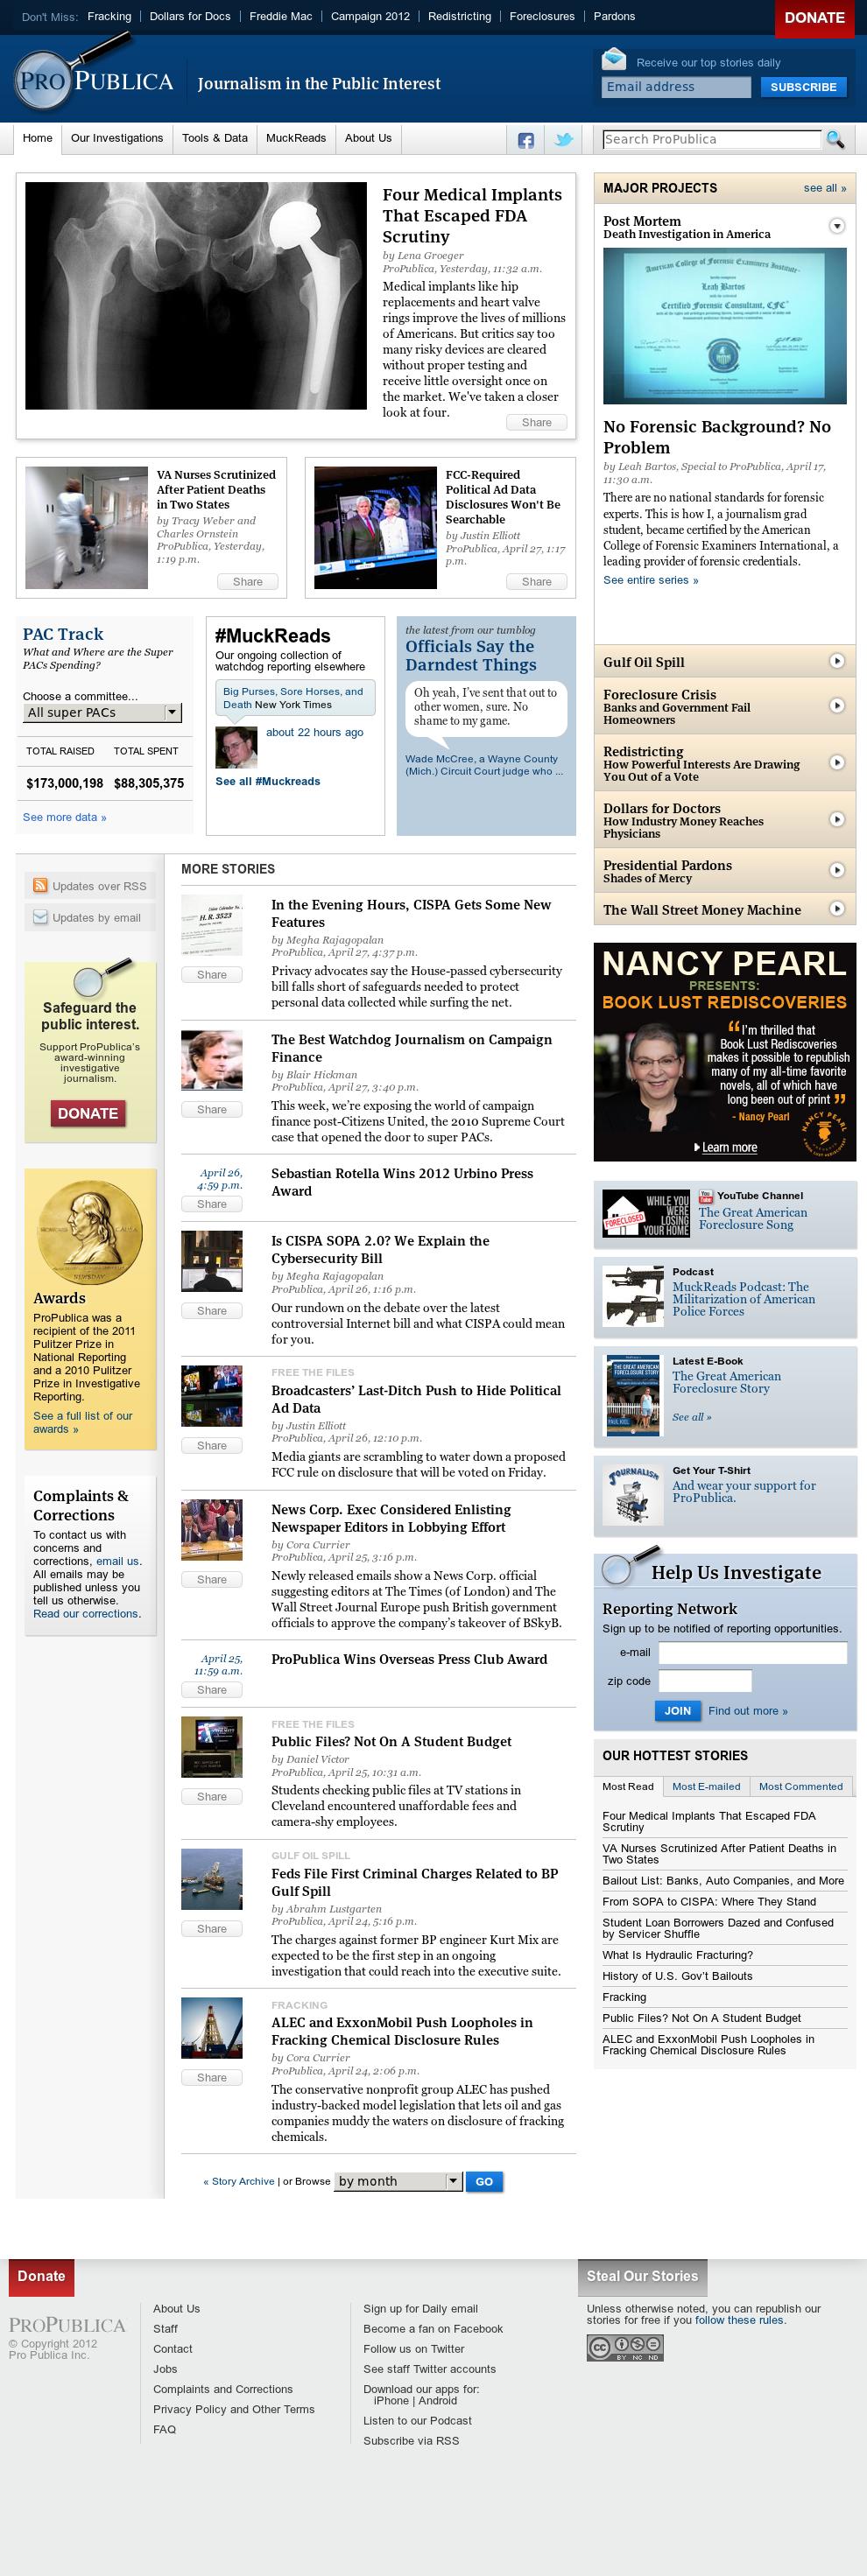 ProPublica at Tuesday May 1, 2012, 12:13 p.m. UTC